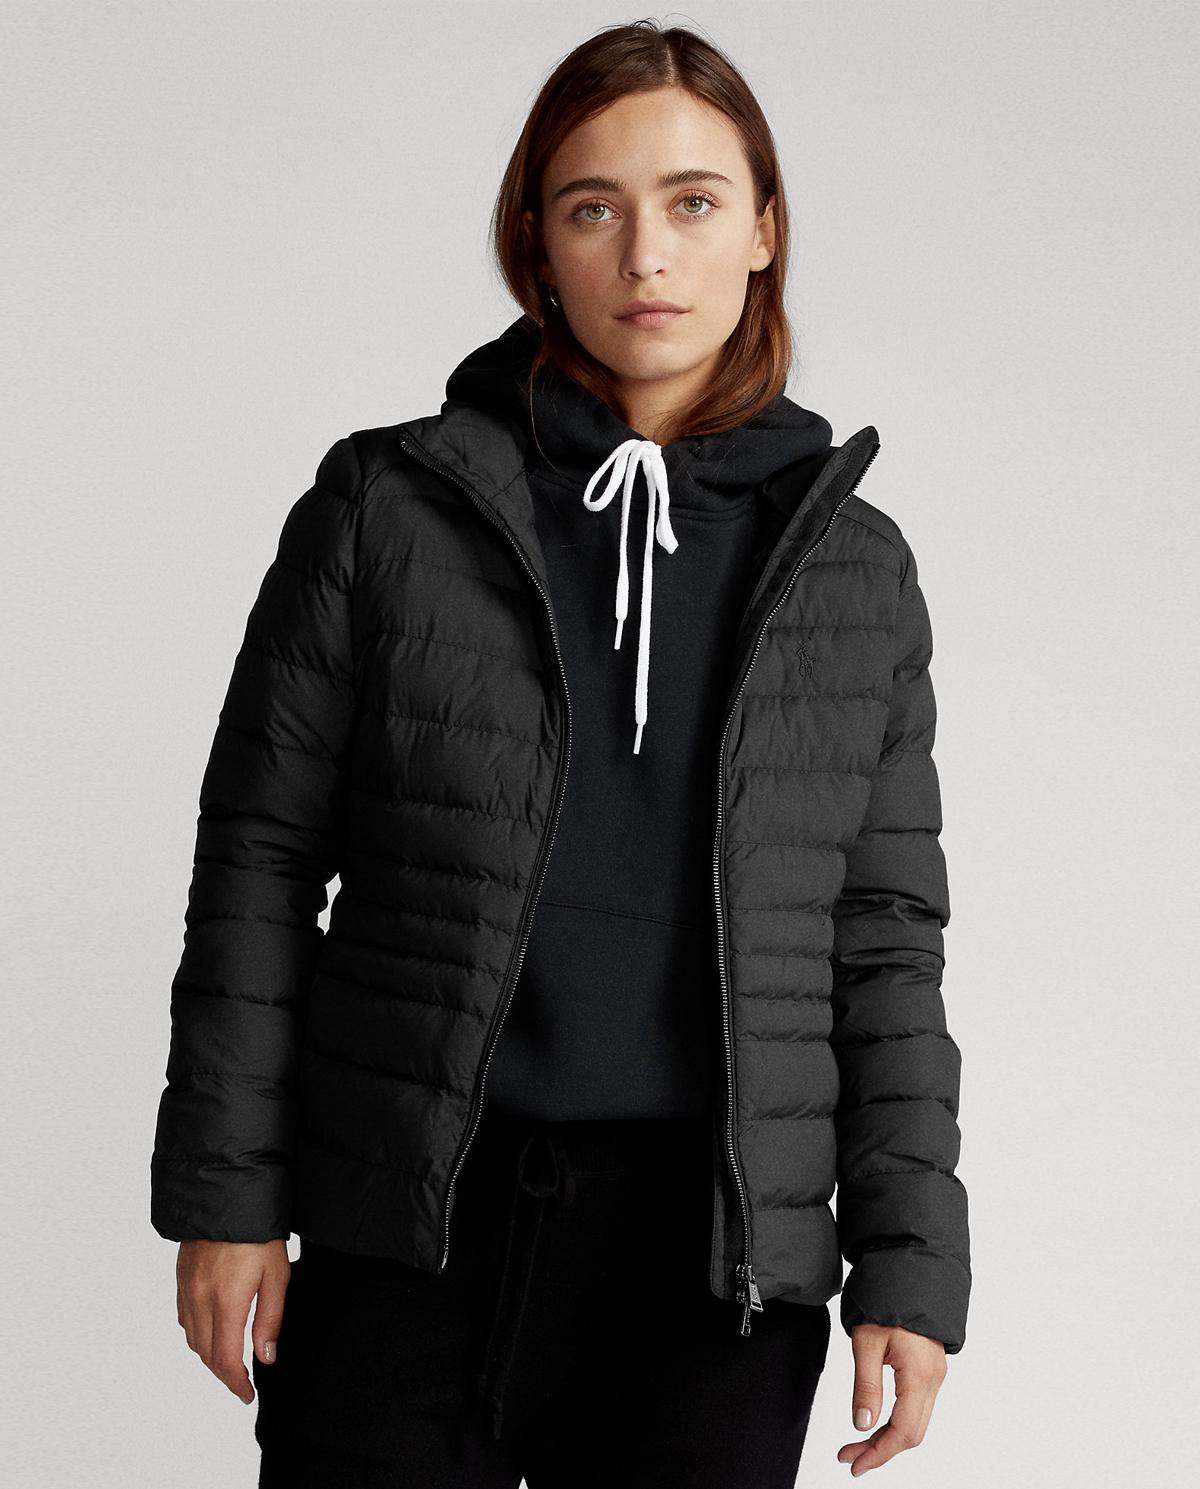 Czarna kurtka puchowa Polo Ralph Lauren 211798841001